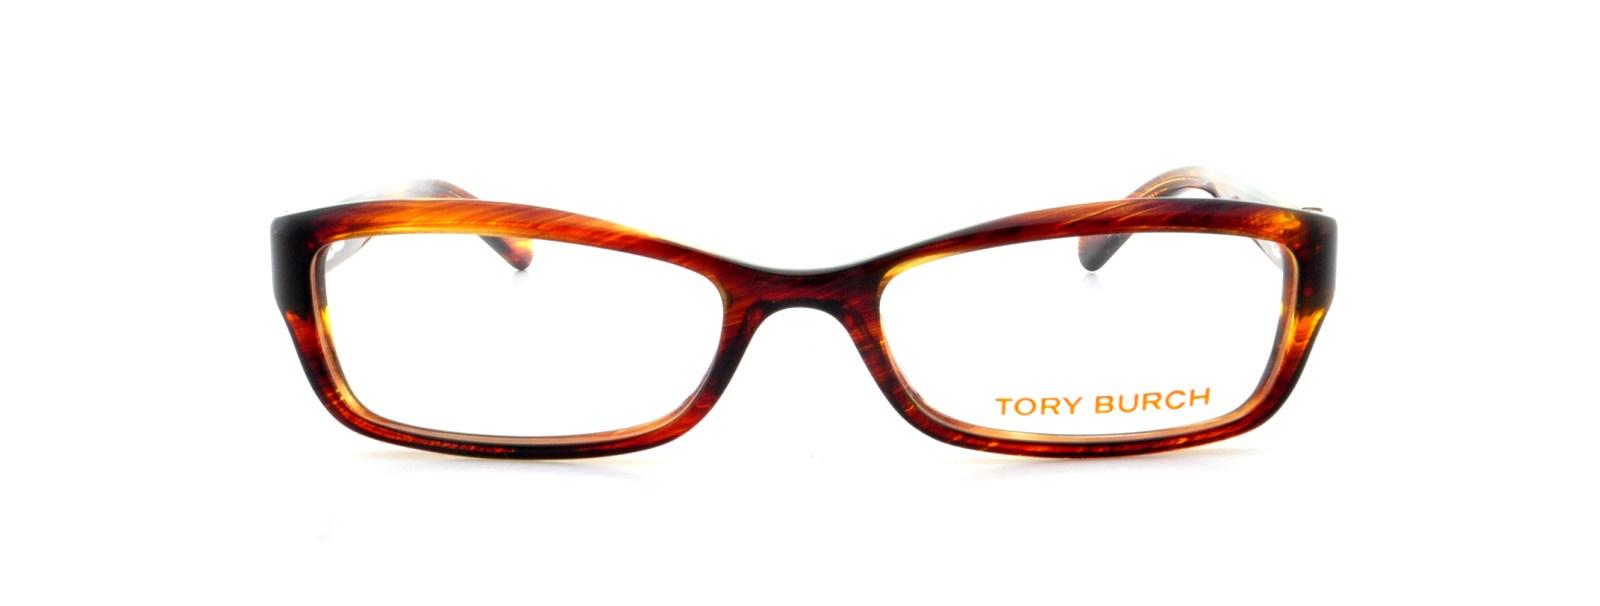 1b8ceb9e389f Designer Frames Outlet. Tory Burch TY2010